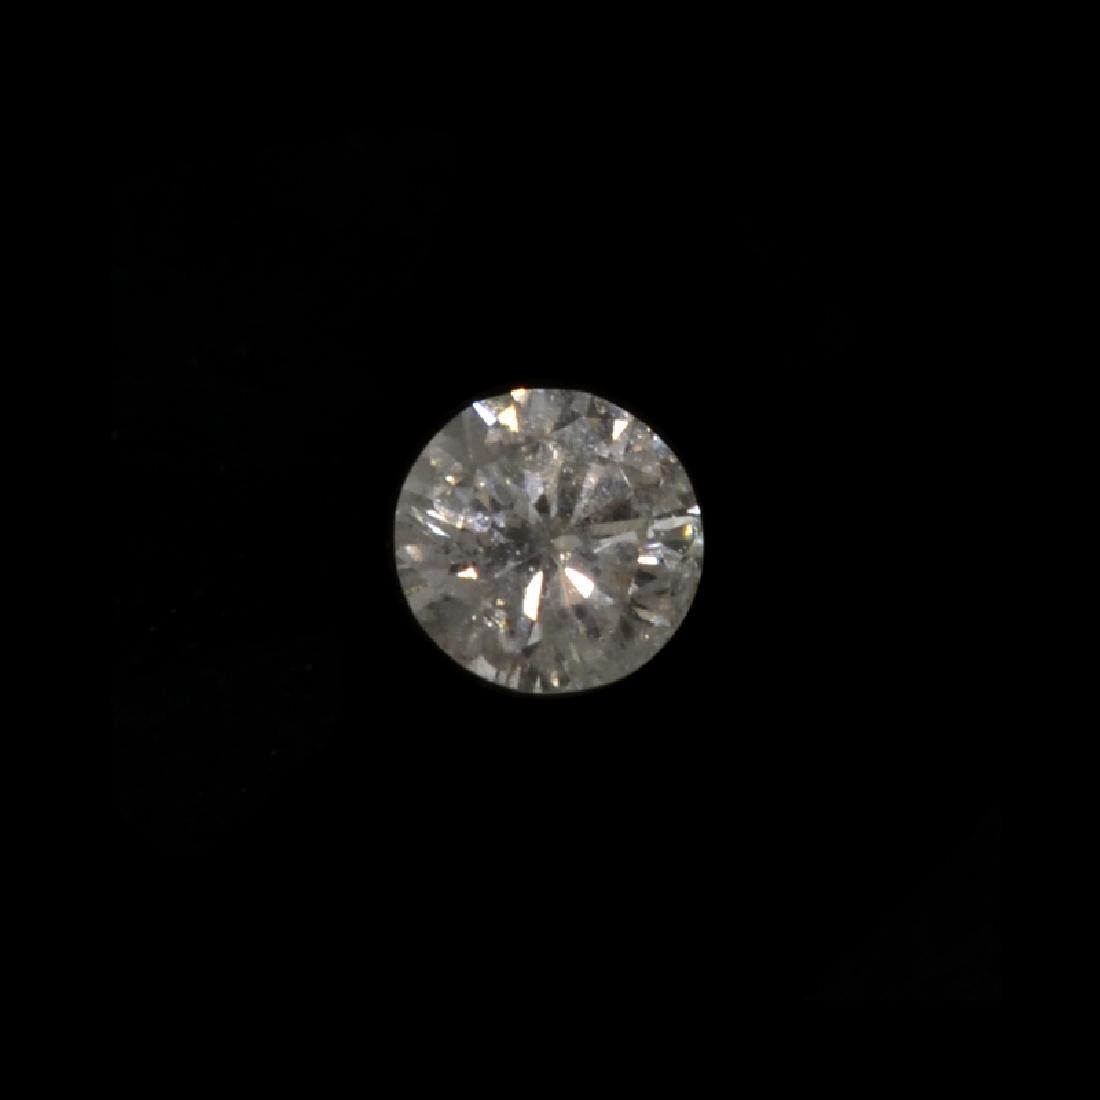 Fine Jewelry GIA Certified 0.20CT Round Brilliant Cut